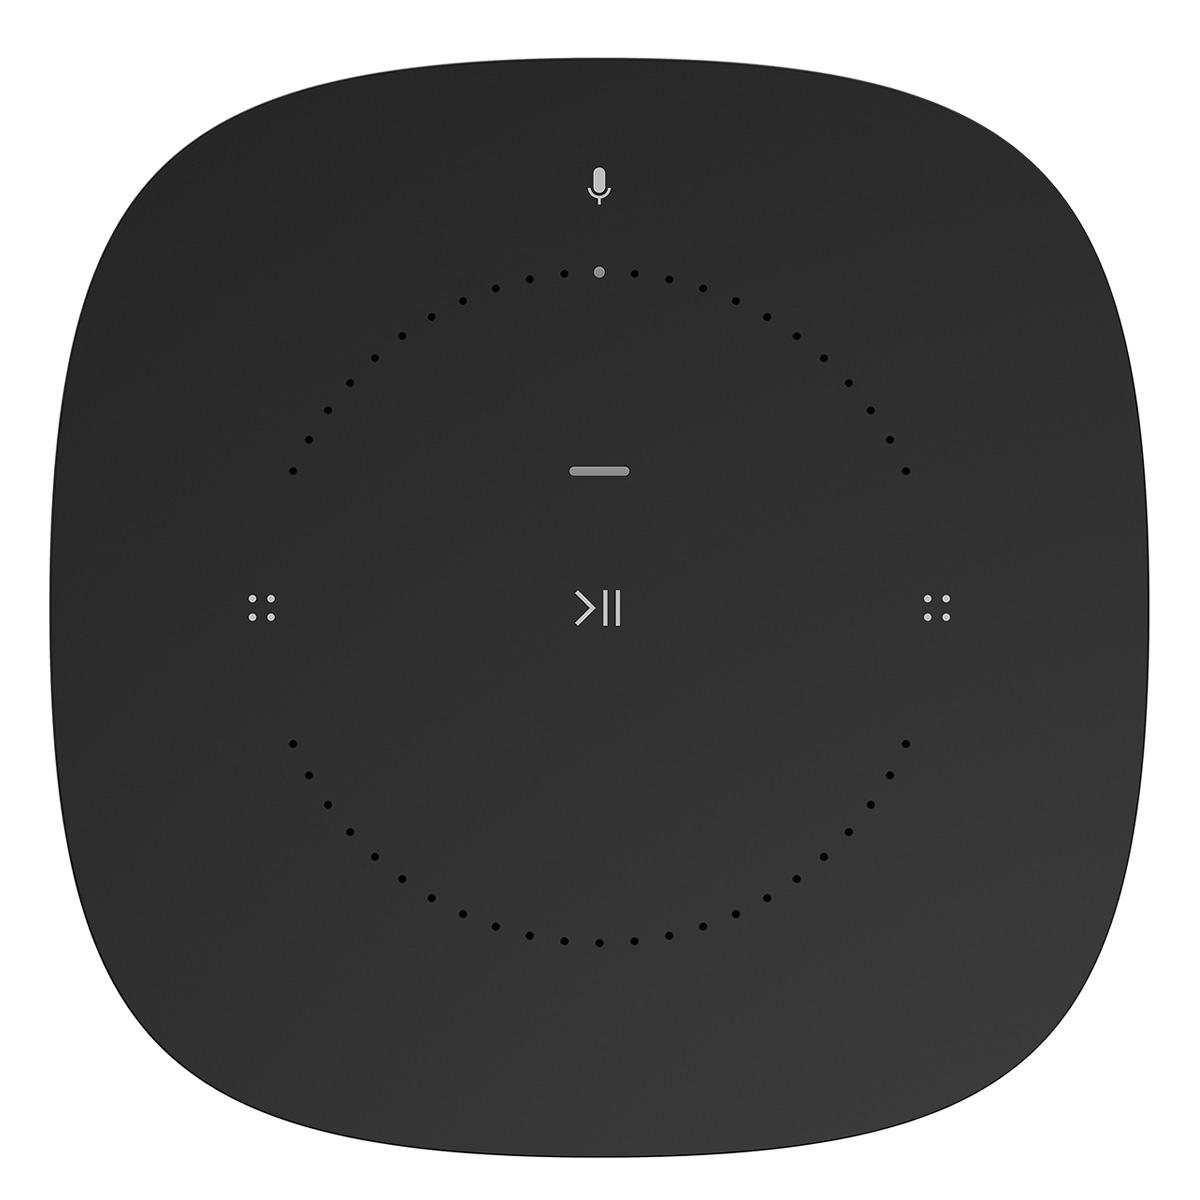 Sonos-One-Voice-Controlled-Wireless-Smart-Speaker-Gen-2 thumbnail 10